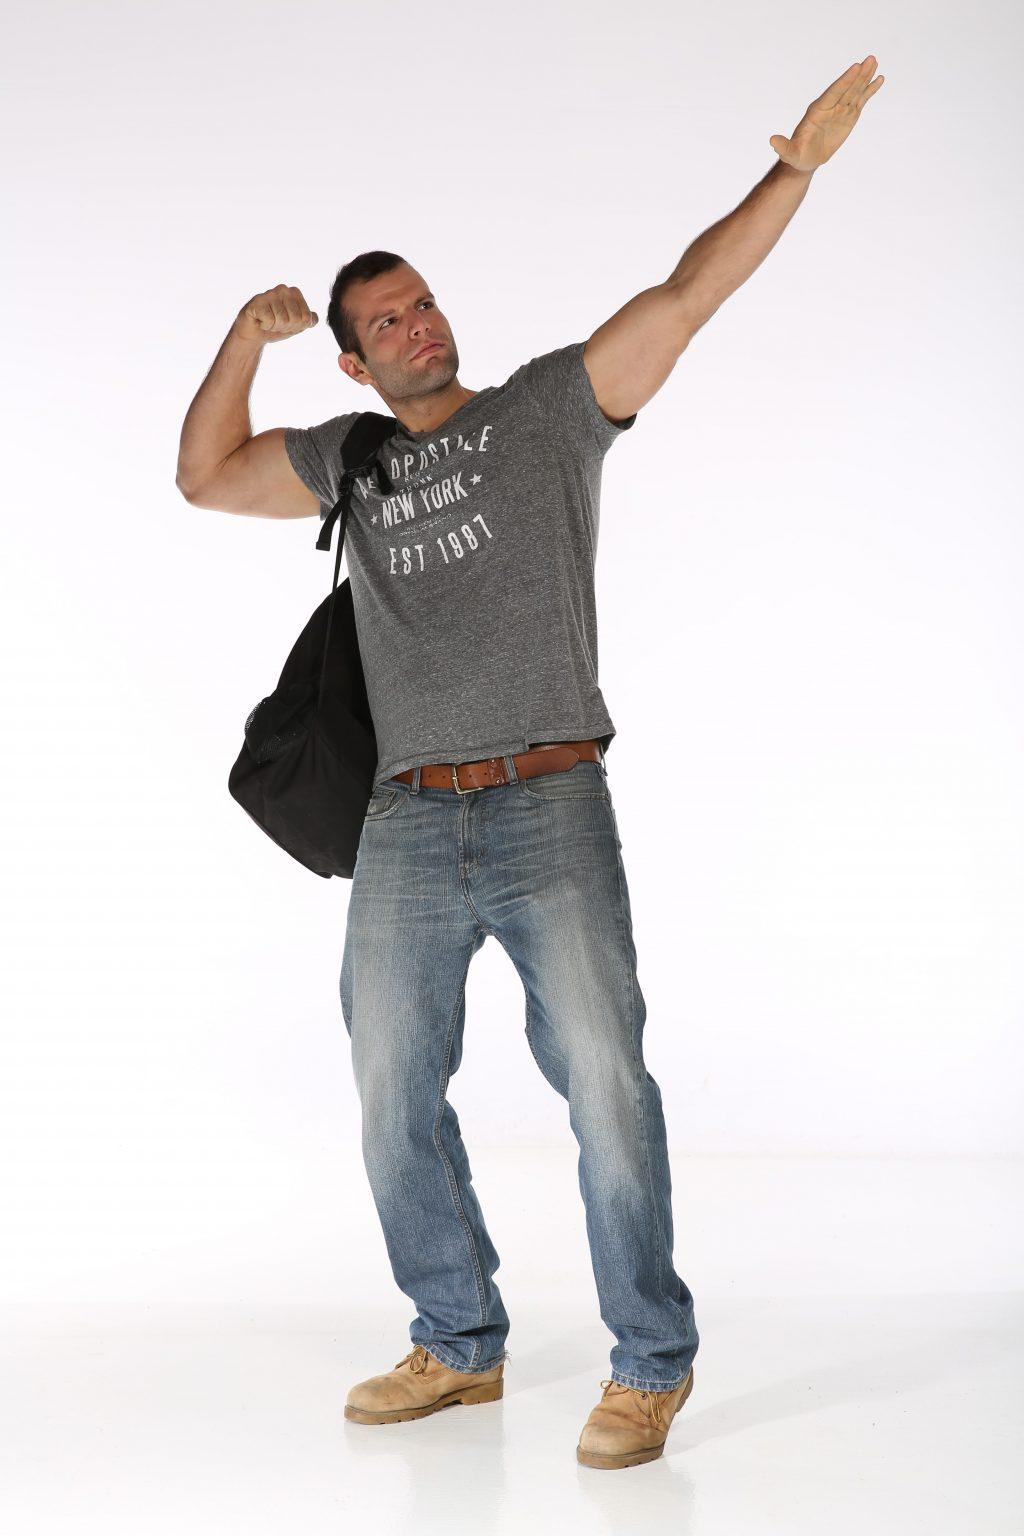 Personal Trainer Austin, Texas - John Cooper